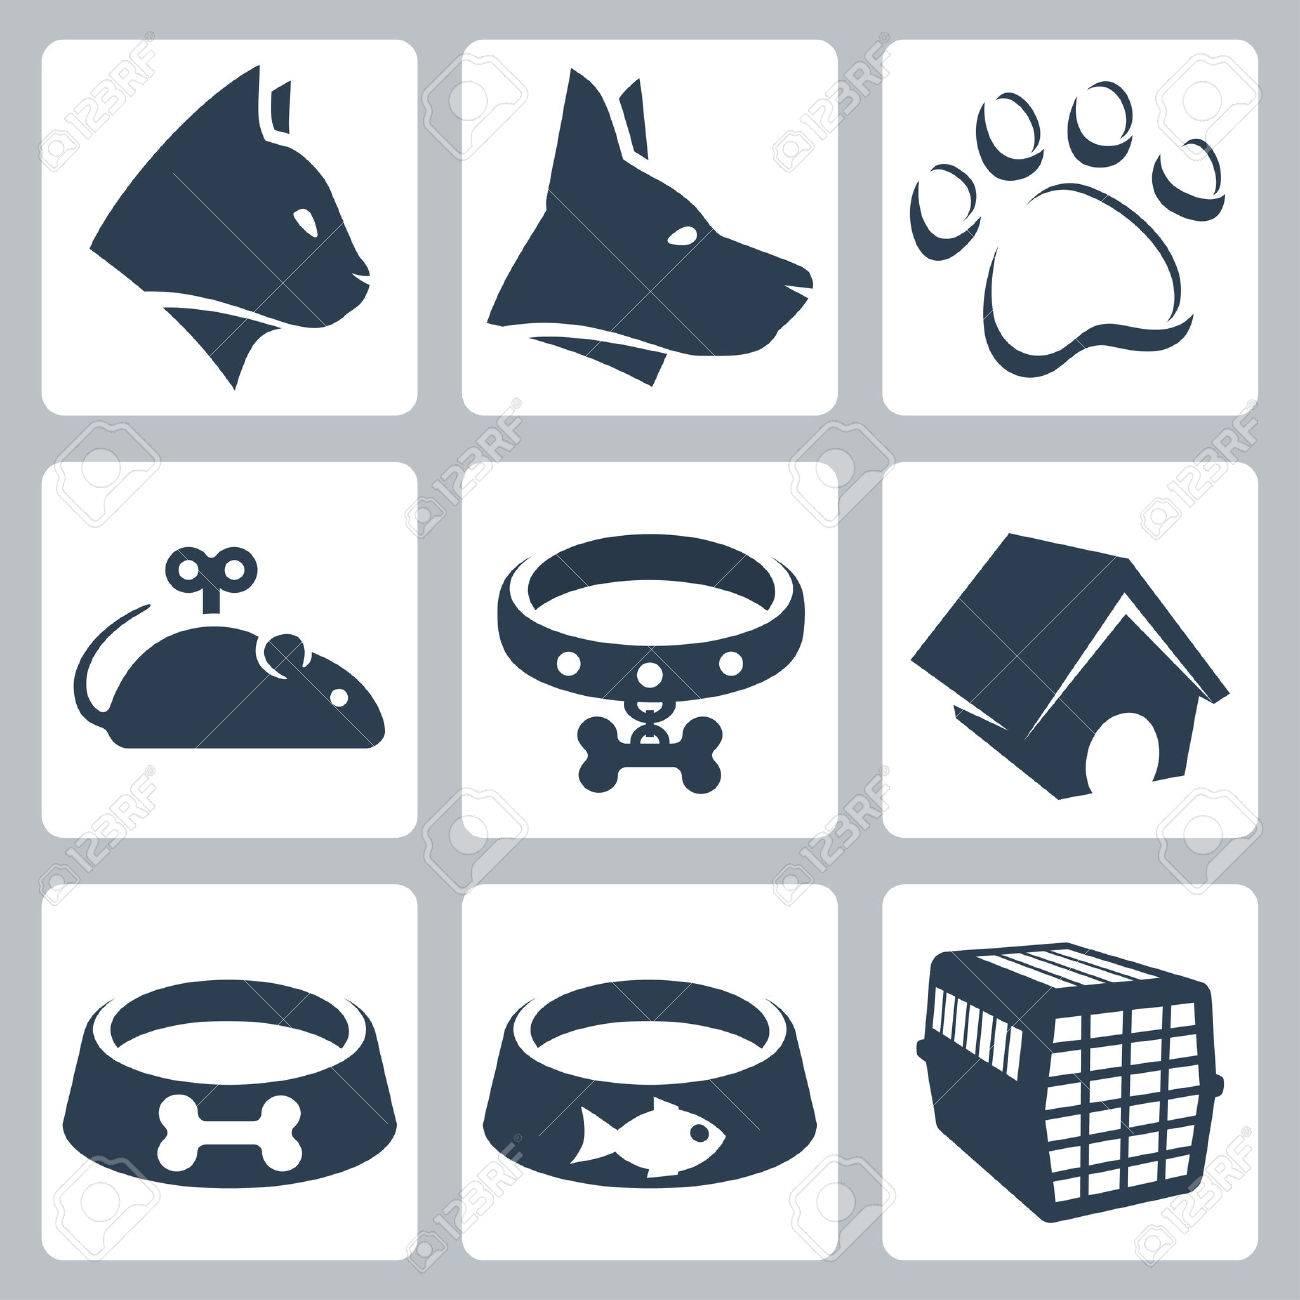 11,815 Dog Bone Cliparts, Stock Vector And Royalty Free Dog Bone ...